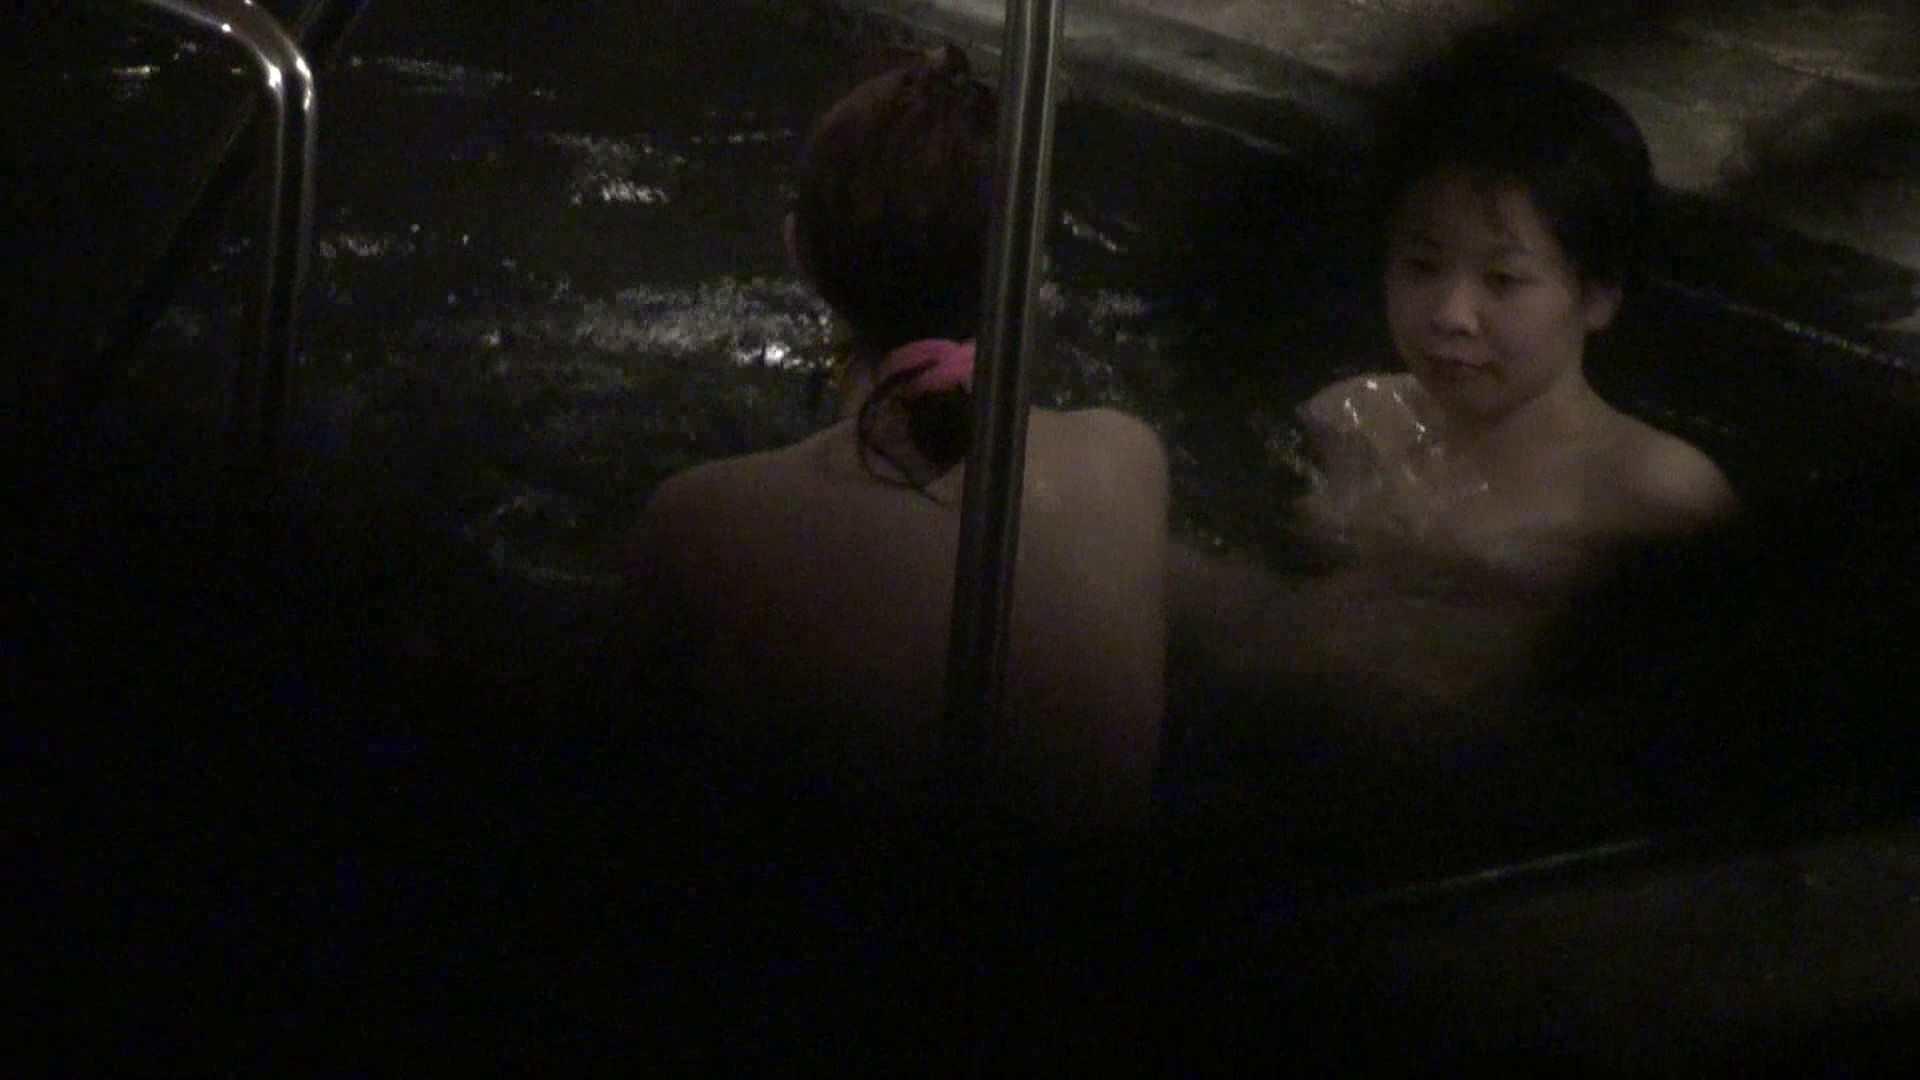 Aquaな露天風呂Vol.394 盗撮師作品  70pic 54